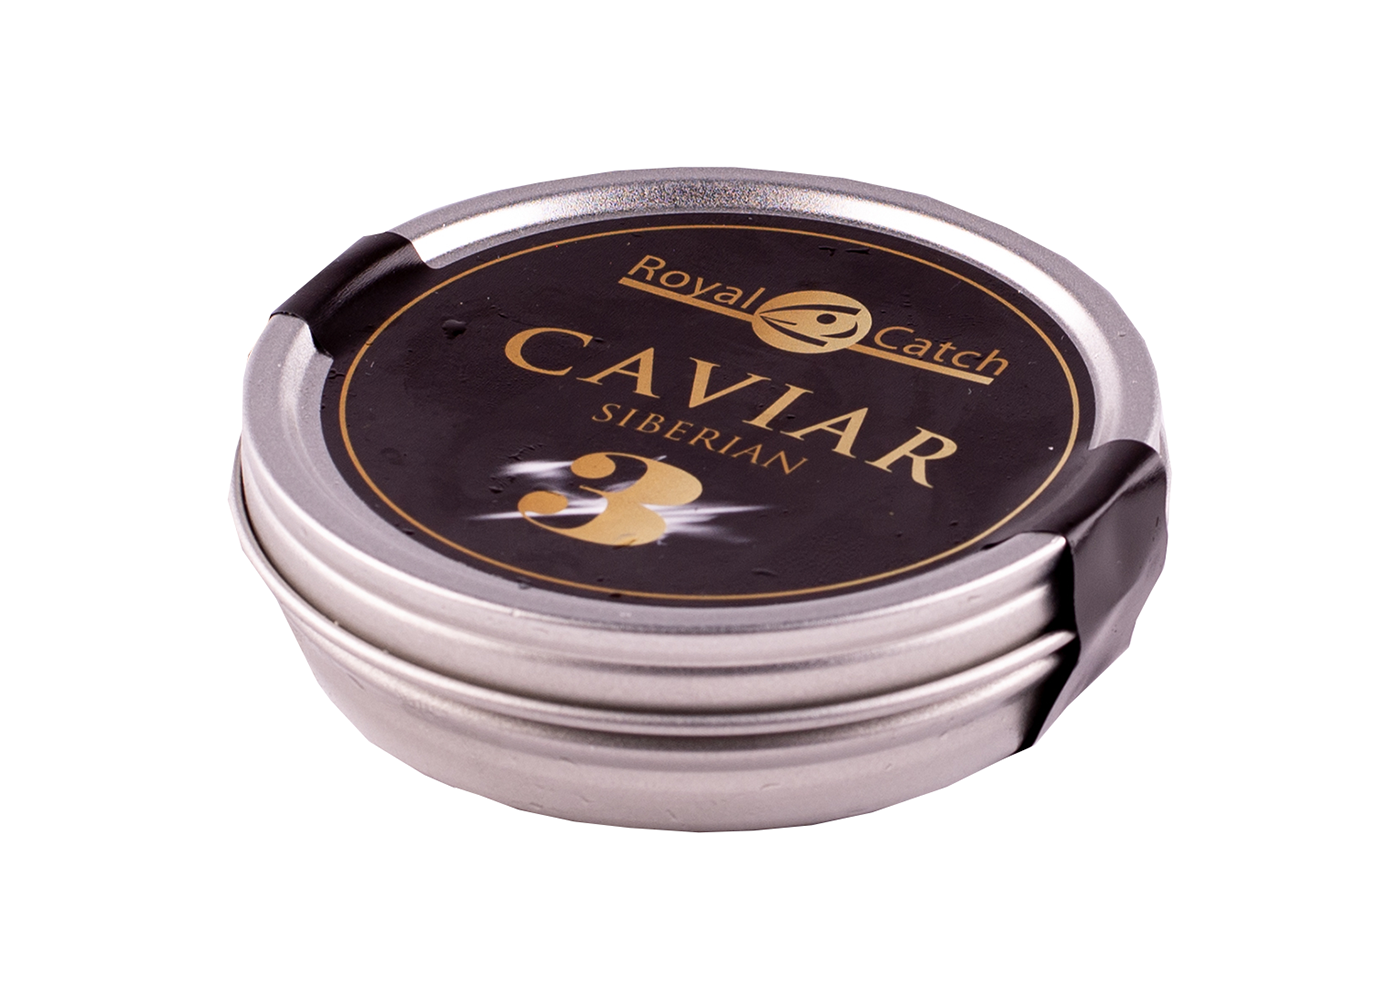 Productafbeelding CAVIAR IMPERIAL NR. 1 - 125 GRAM